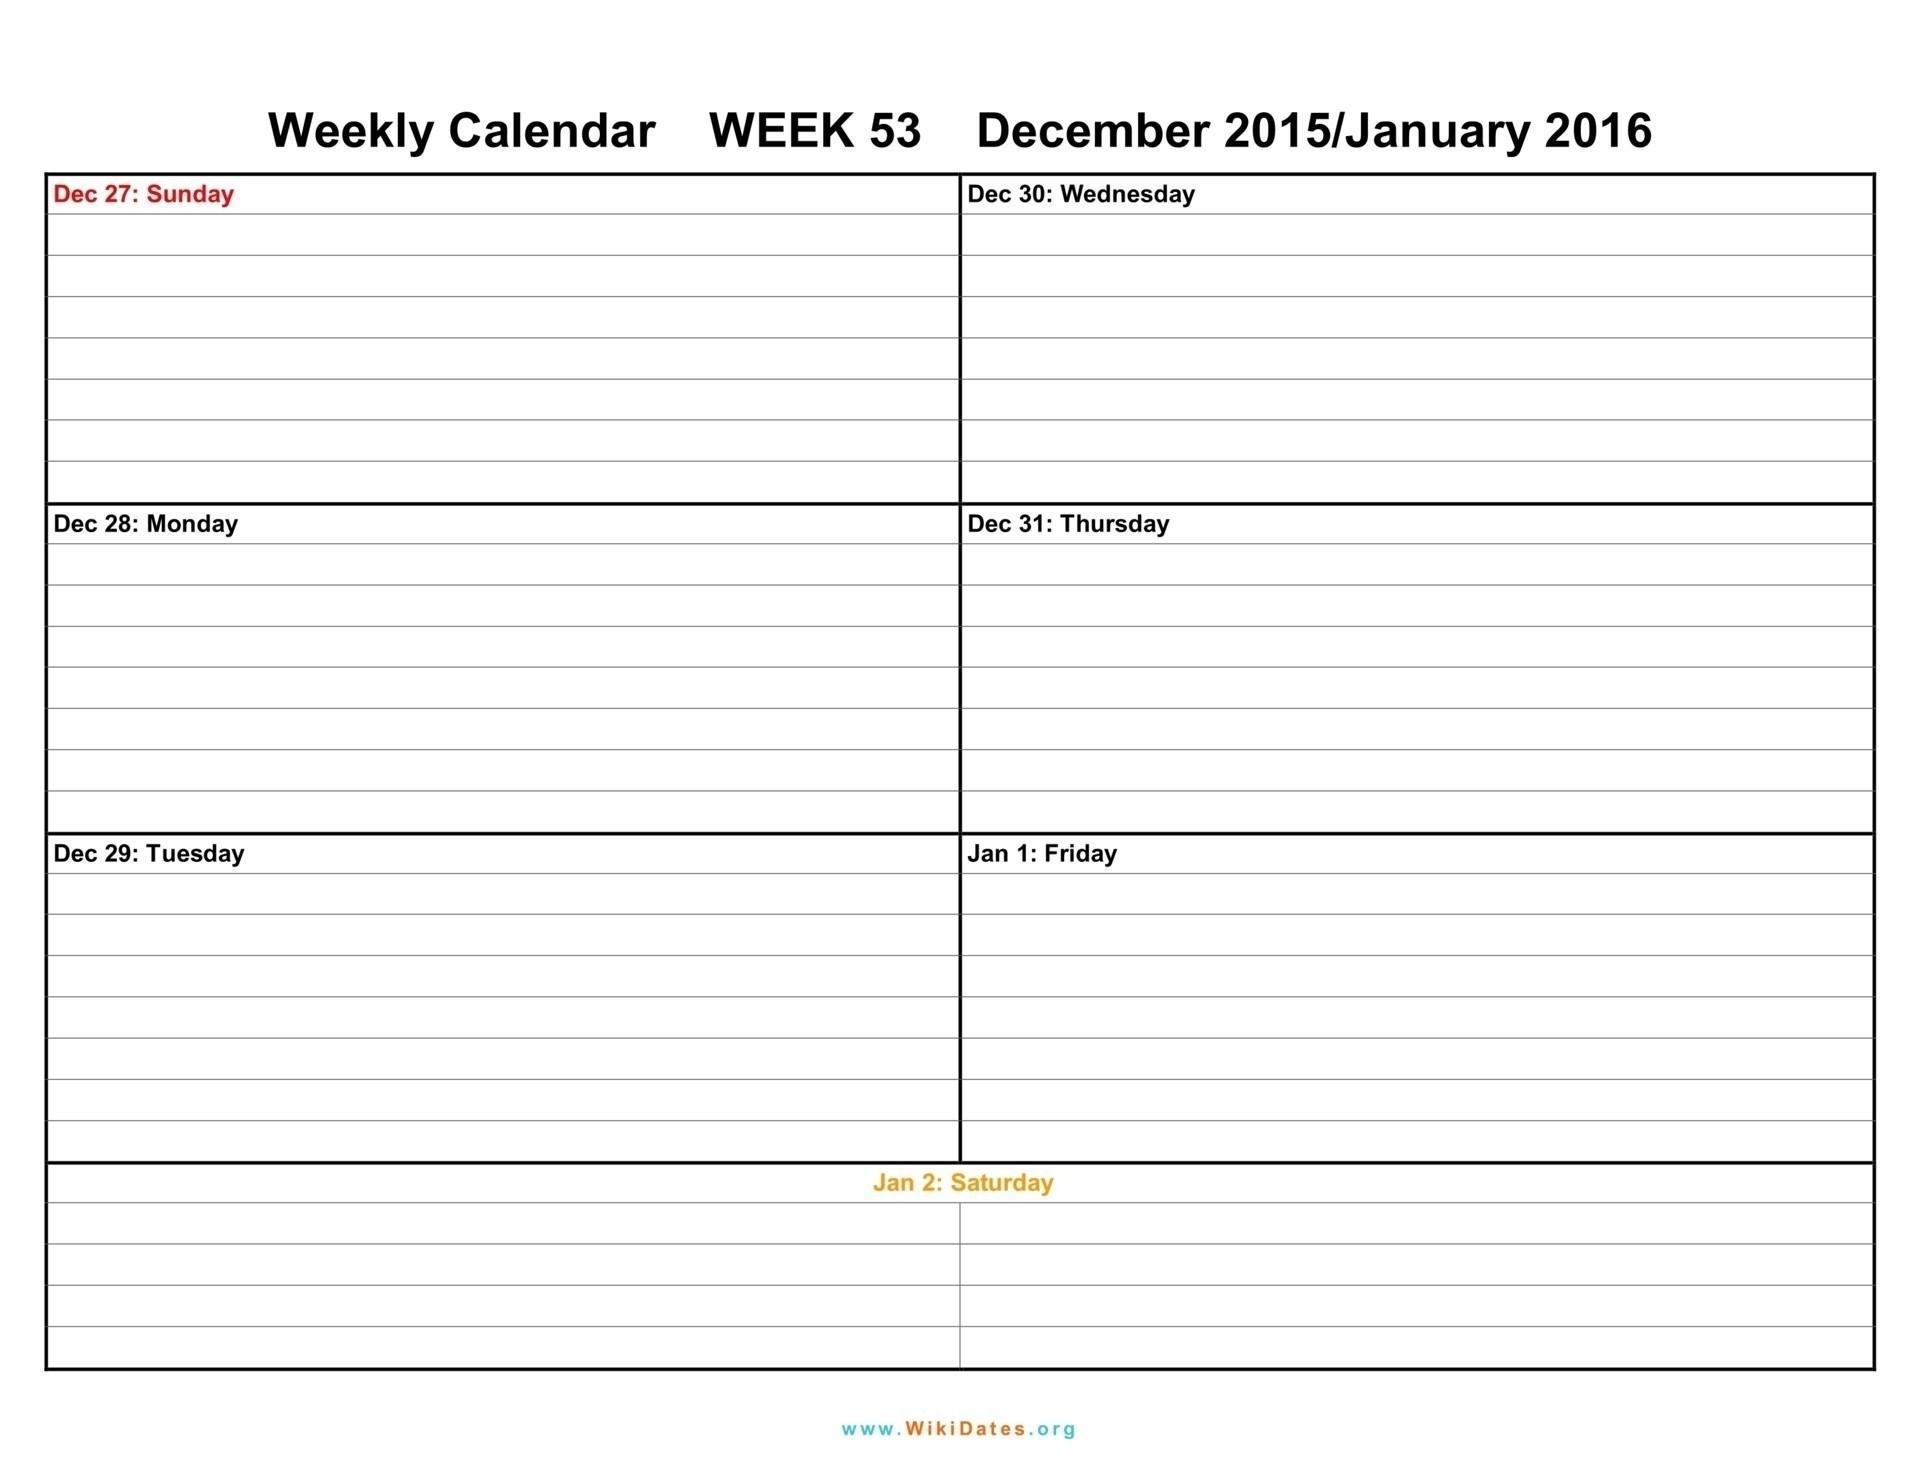 Free Two Week Calendar Template Intable Schedule Weeks Blank | Smorad  Two Week Blank Calendar Template